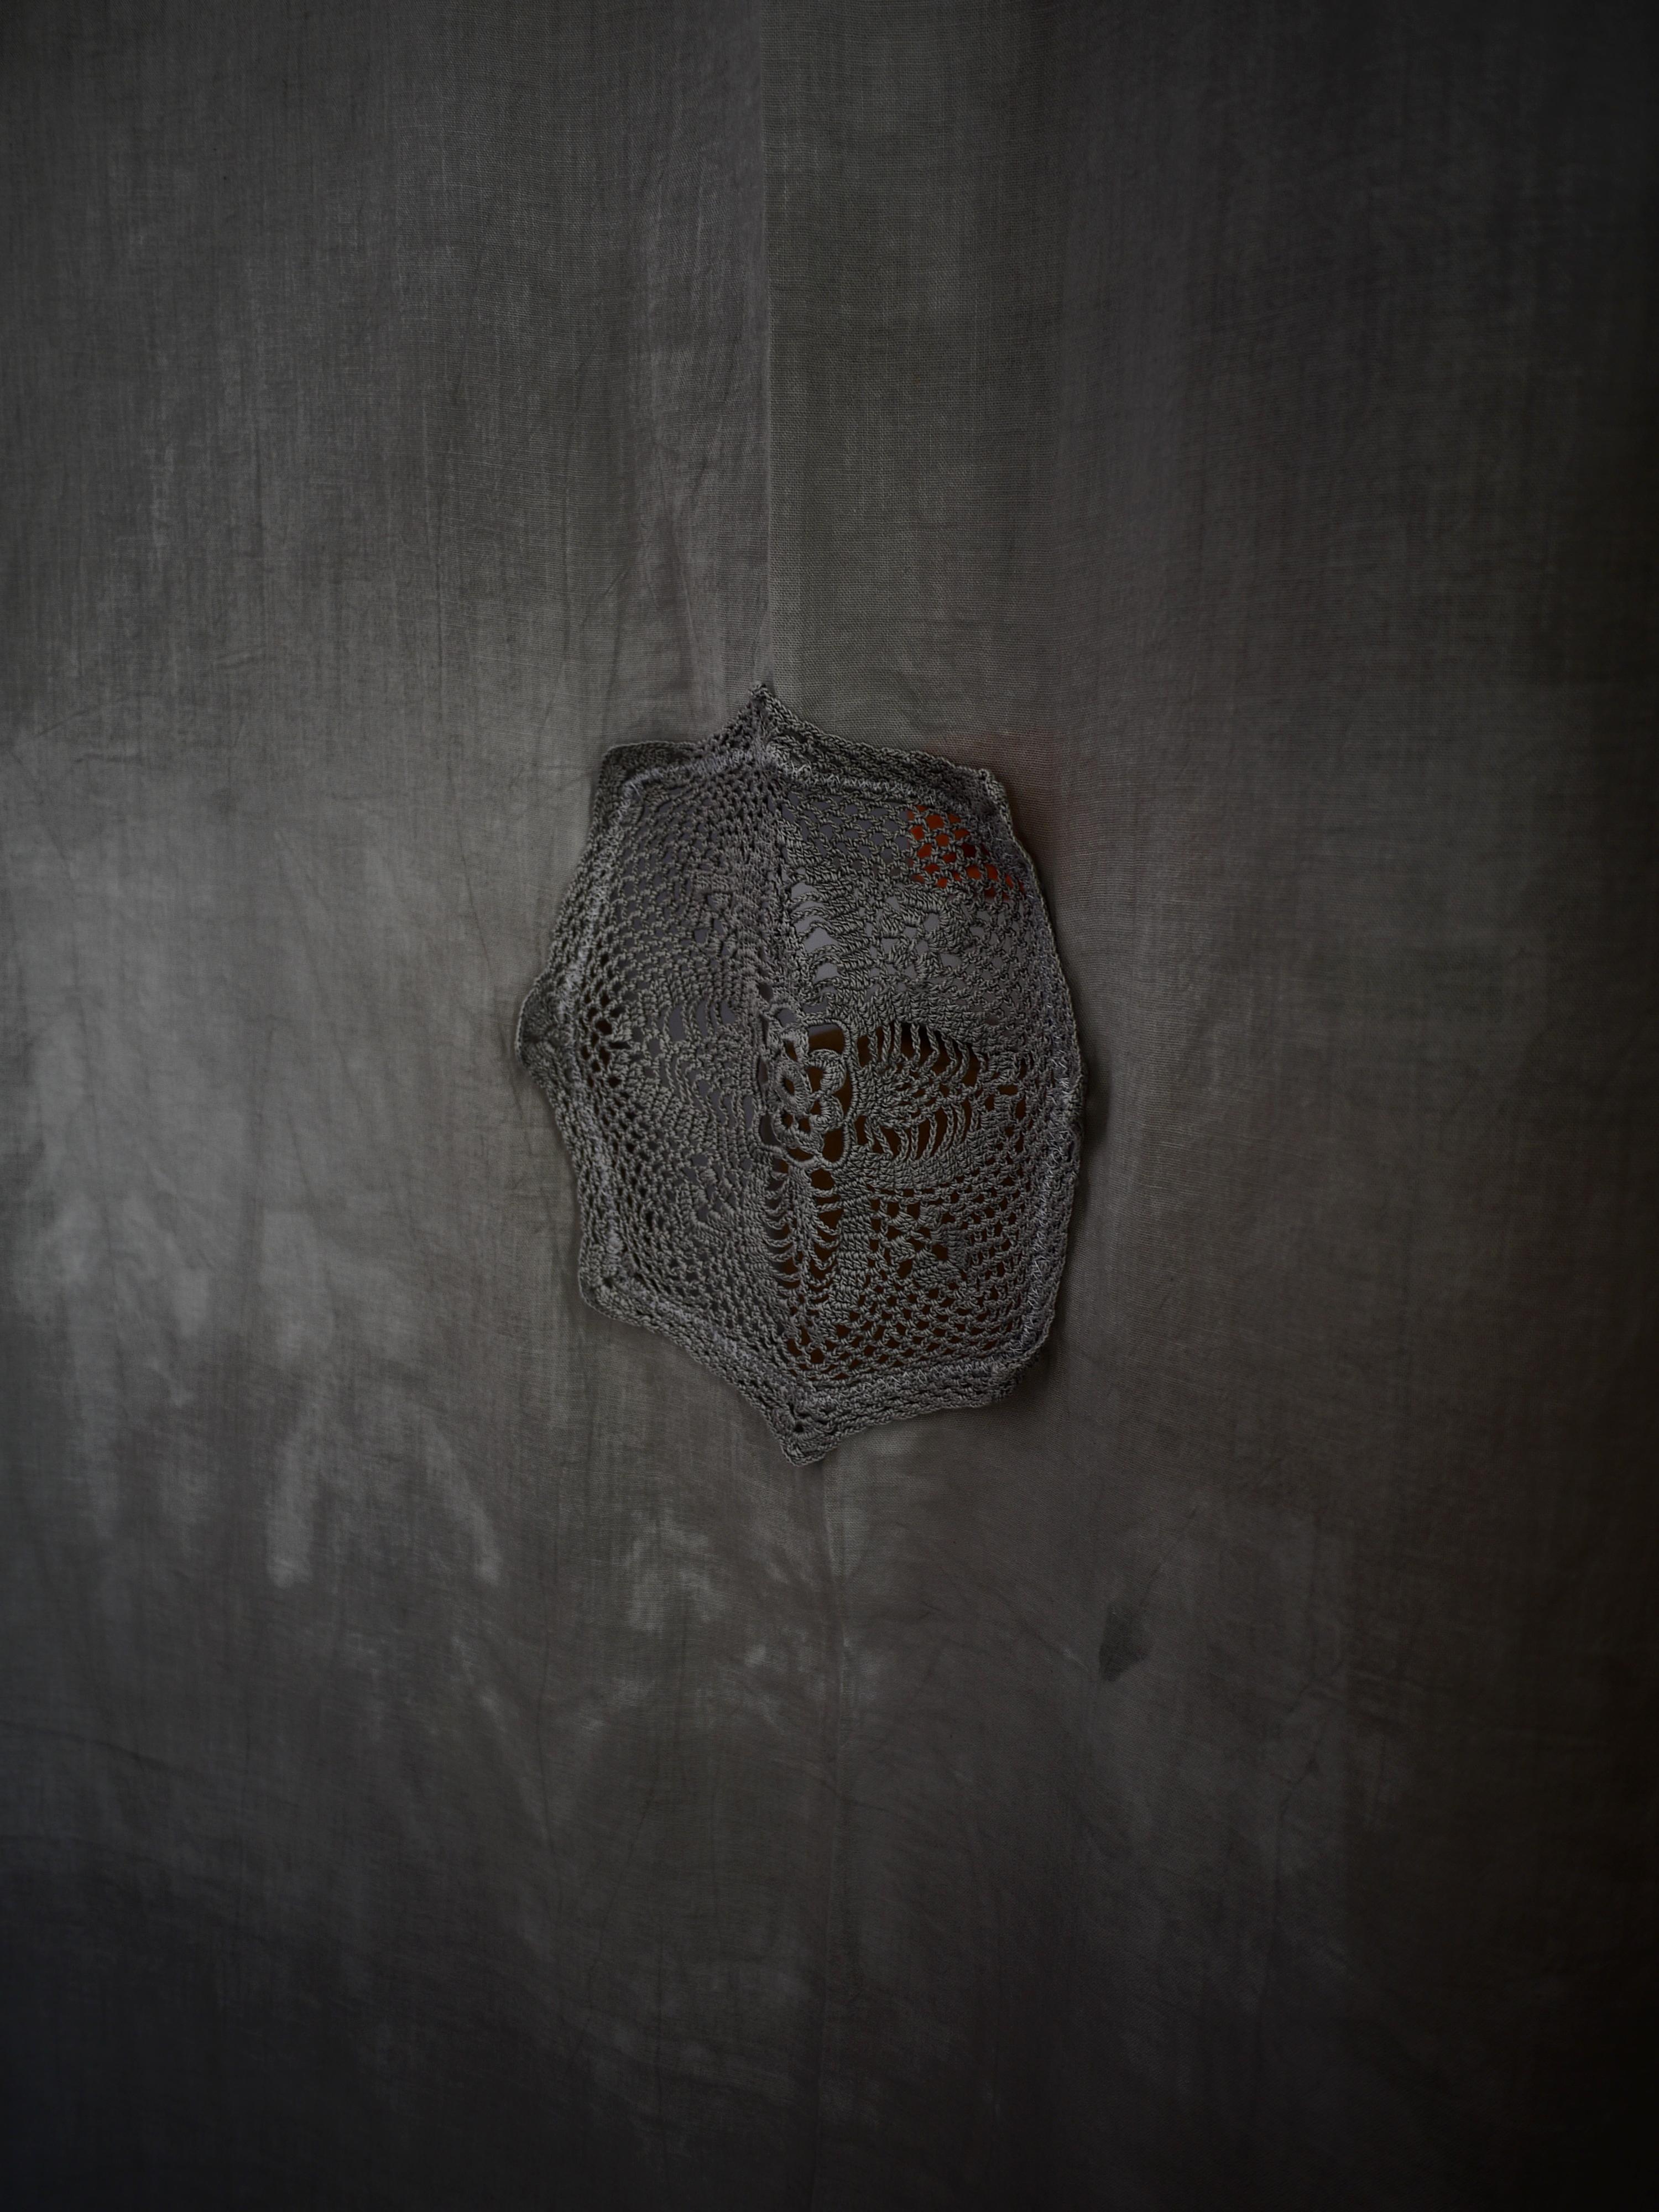 Bracelets LOOM - Design textile by Myriam Balaÿ myriam-balay-cherie15-matiere CHERIE CHERIE L'appartement